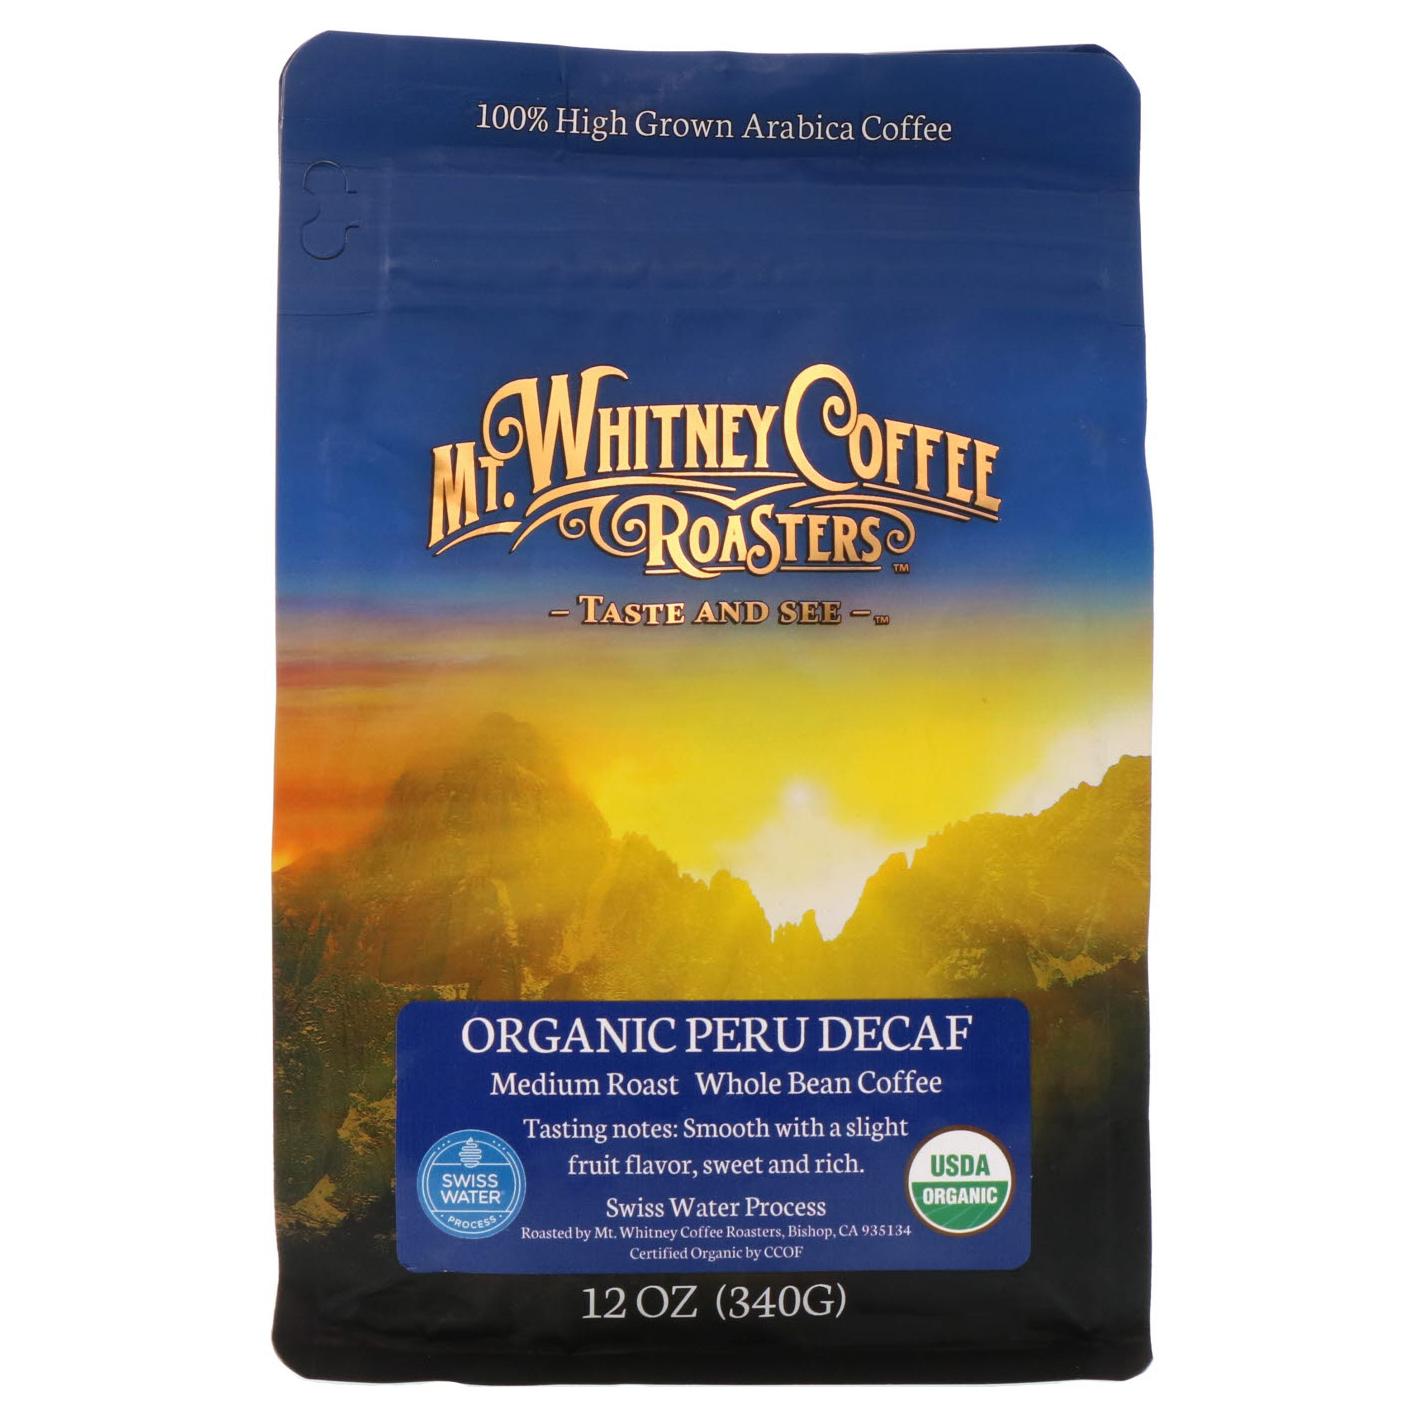 Mt. Whitney Coffee Roasters, Organic Peru Decaf, Whole Bean, 12 oz (